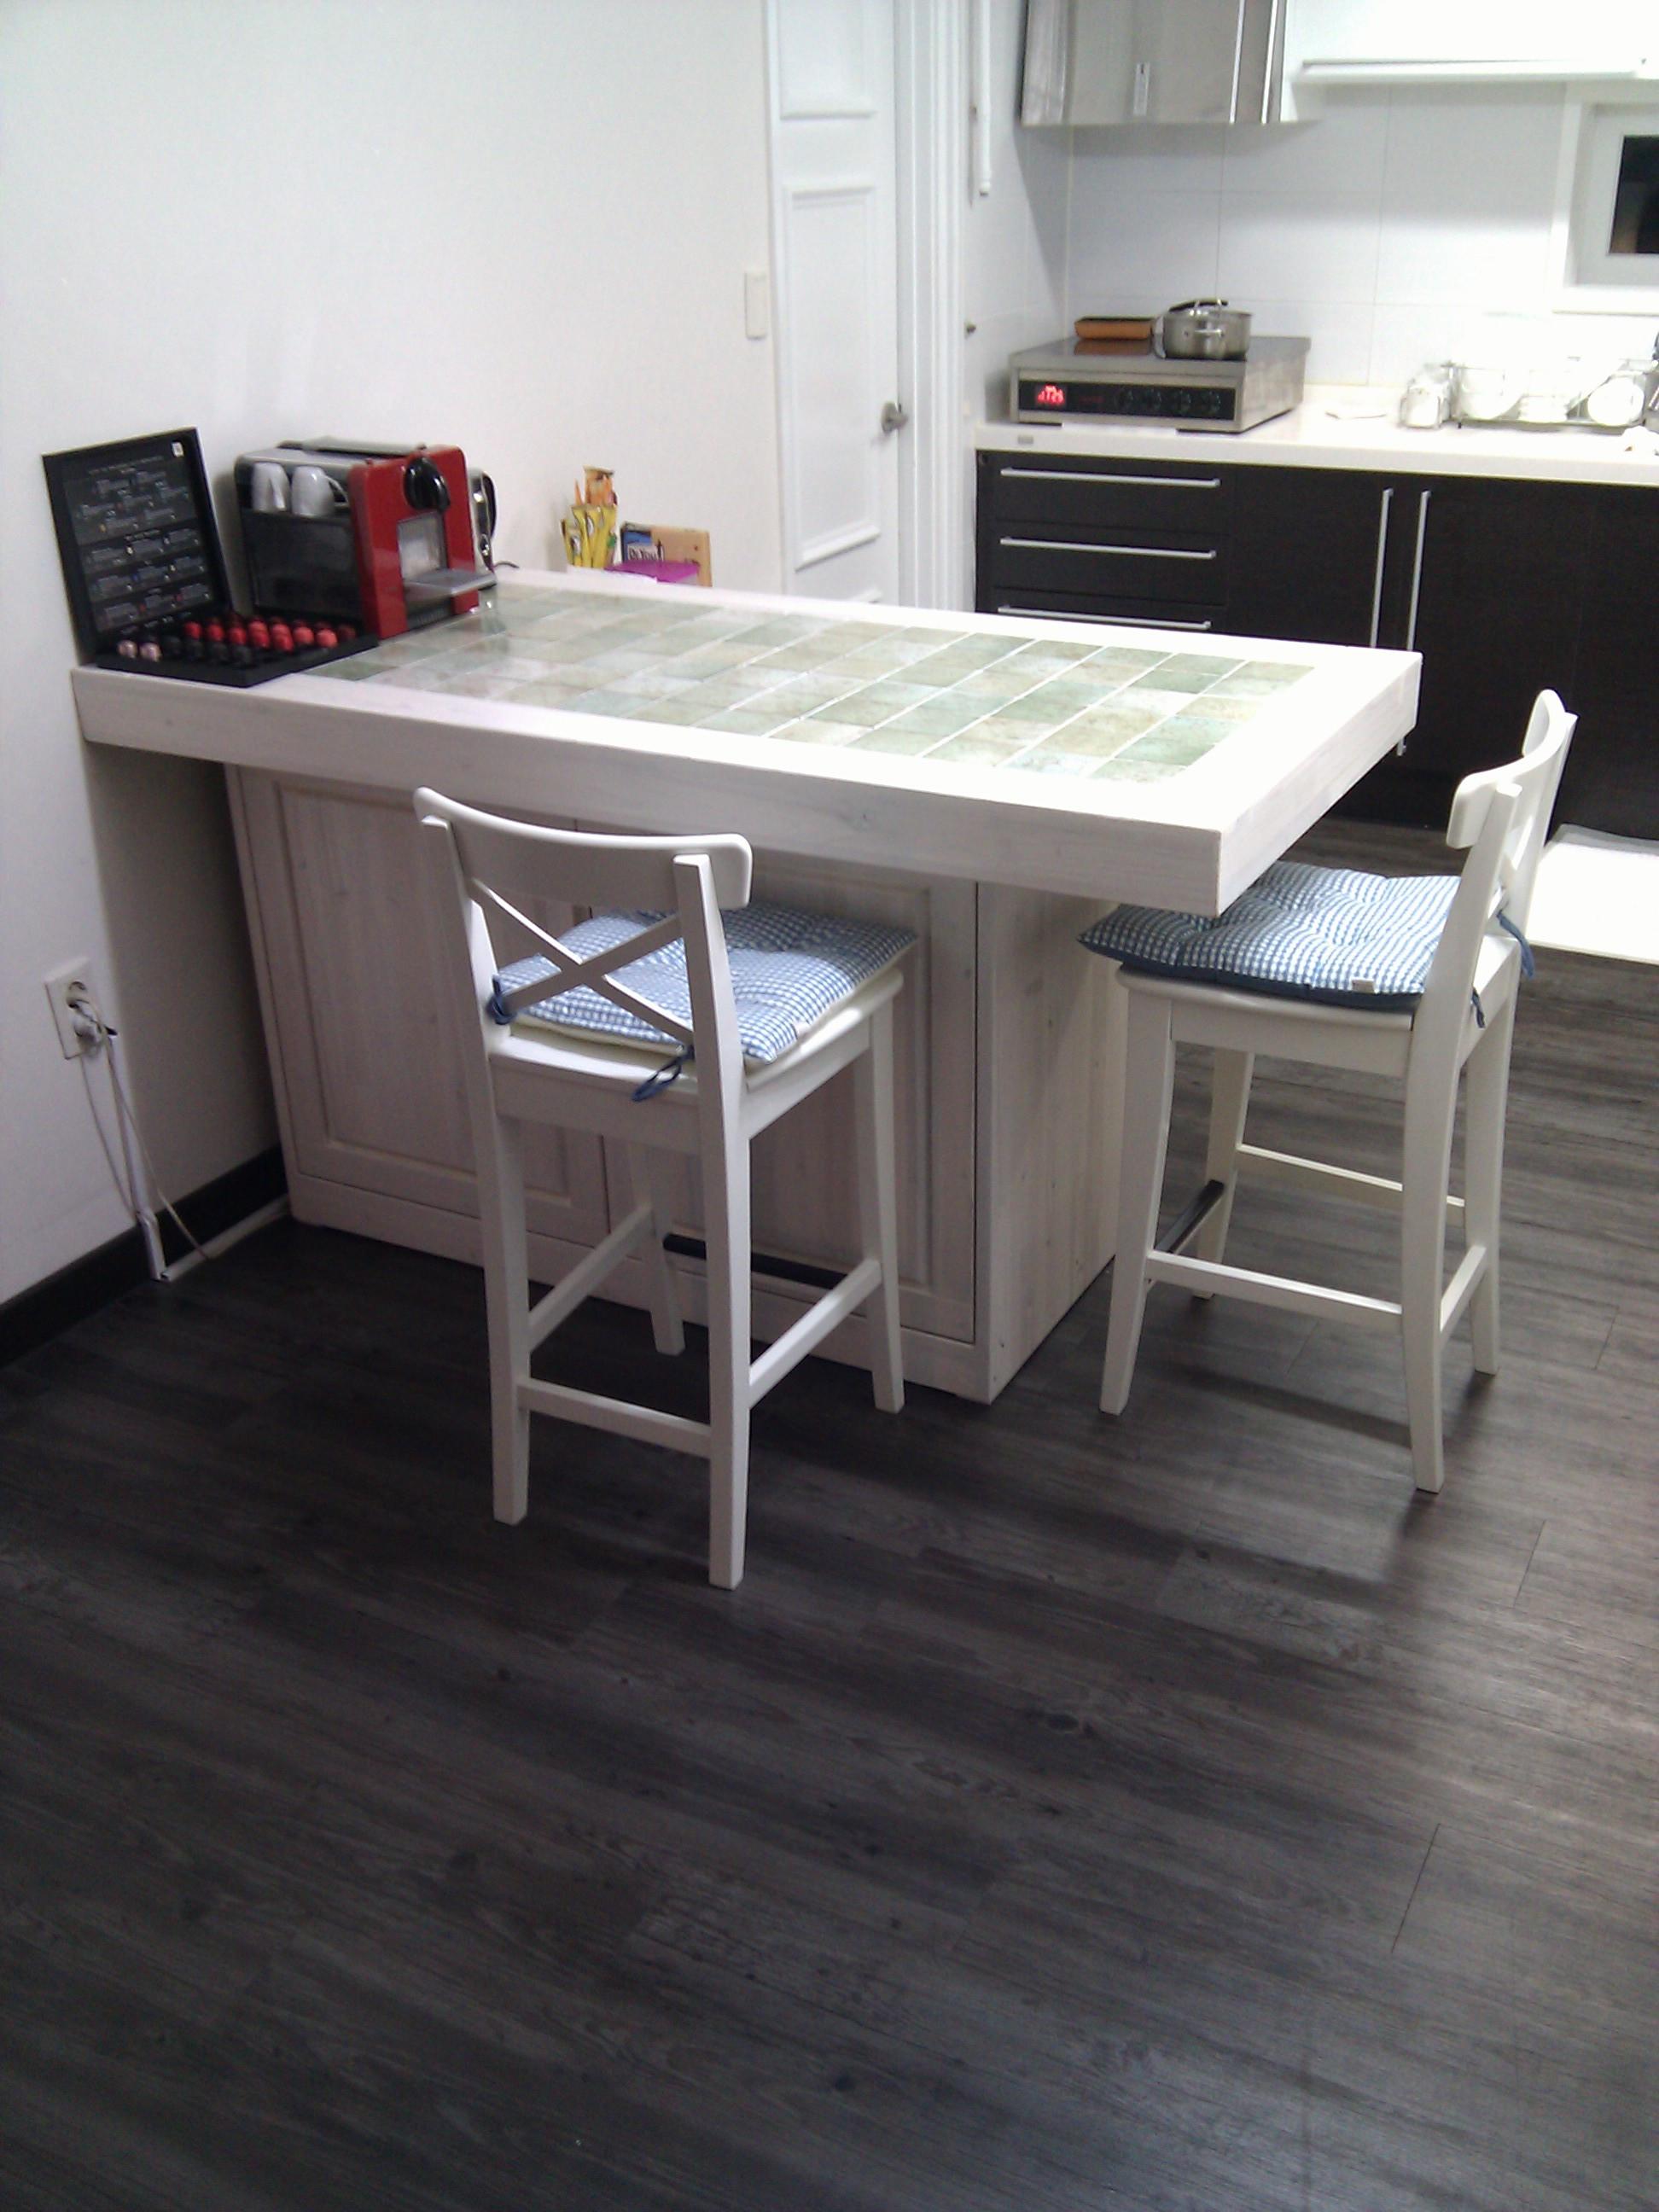 hardwood flooring liquidators ottawa of e§ži¶¤ e€eµ¬ i˜ˆe‹¤i›€iž…e‹ˆe‹¤ regarding y 20110727180810421